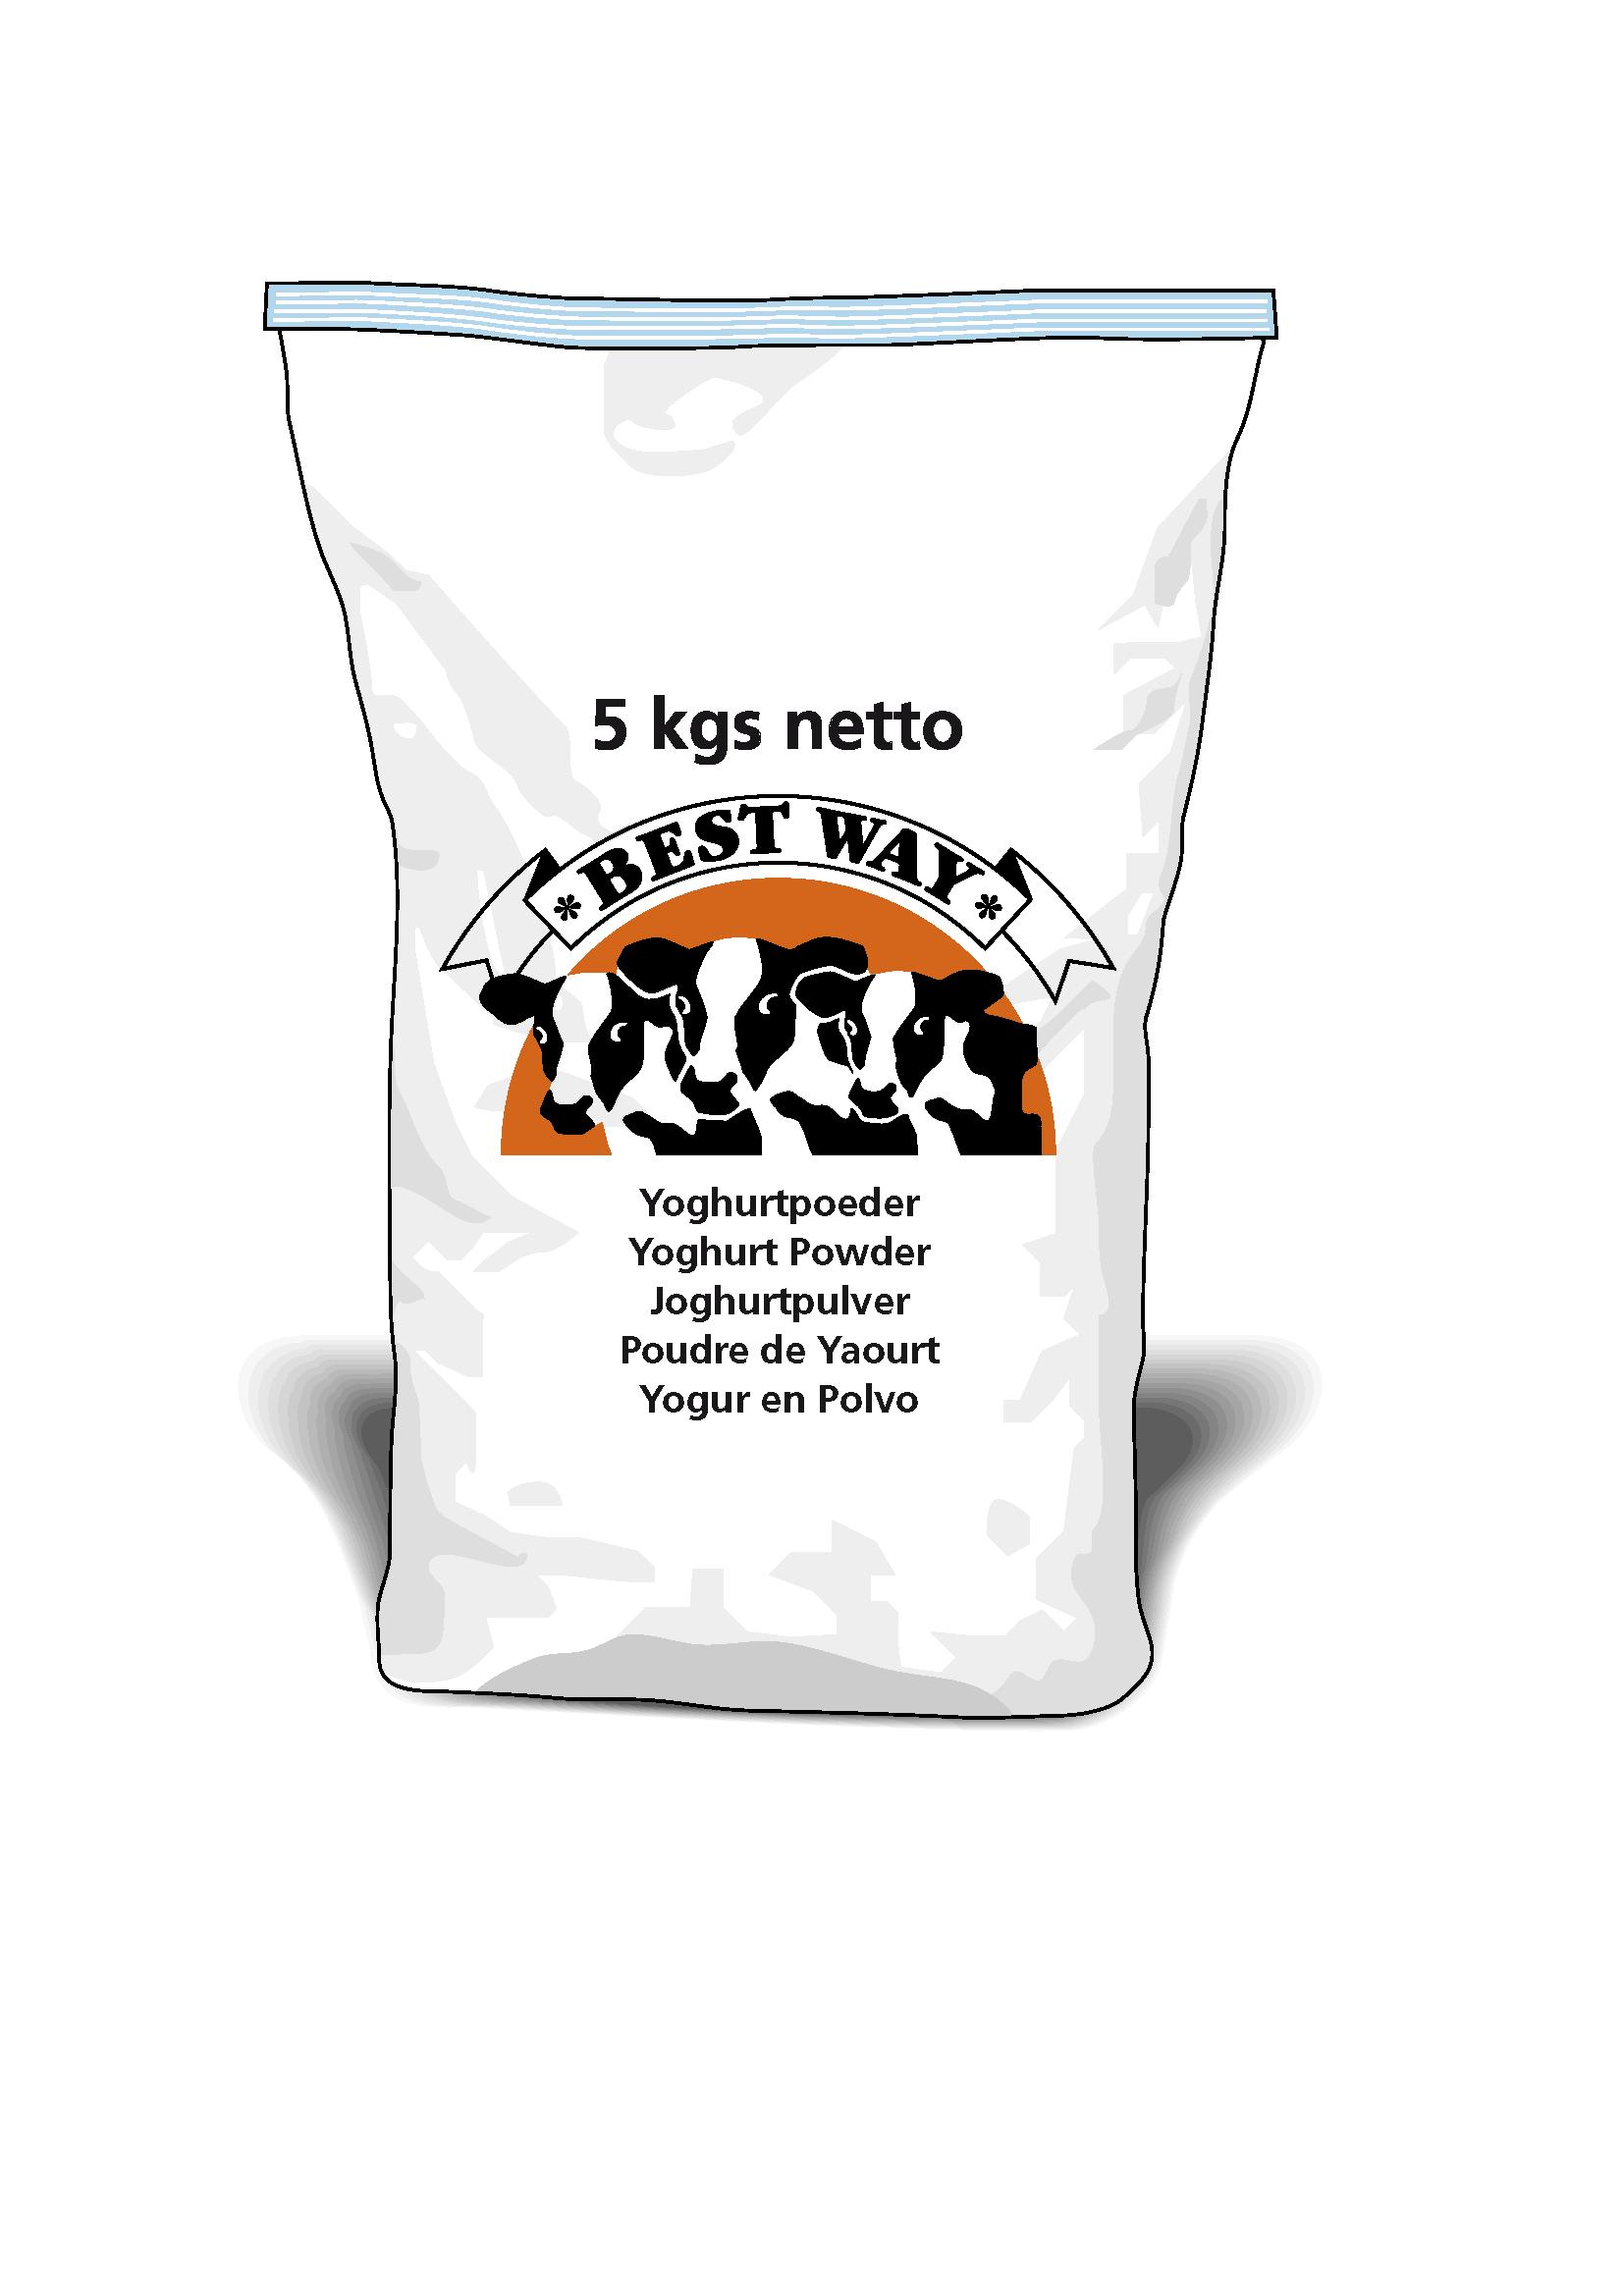 Afbeelding van Yoghurtpoeder 5kg THT 26 03 19